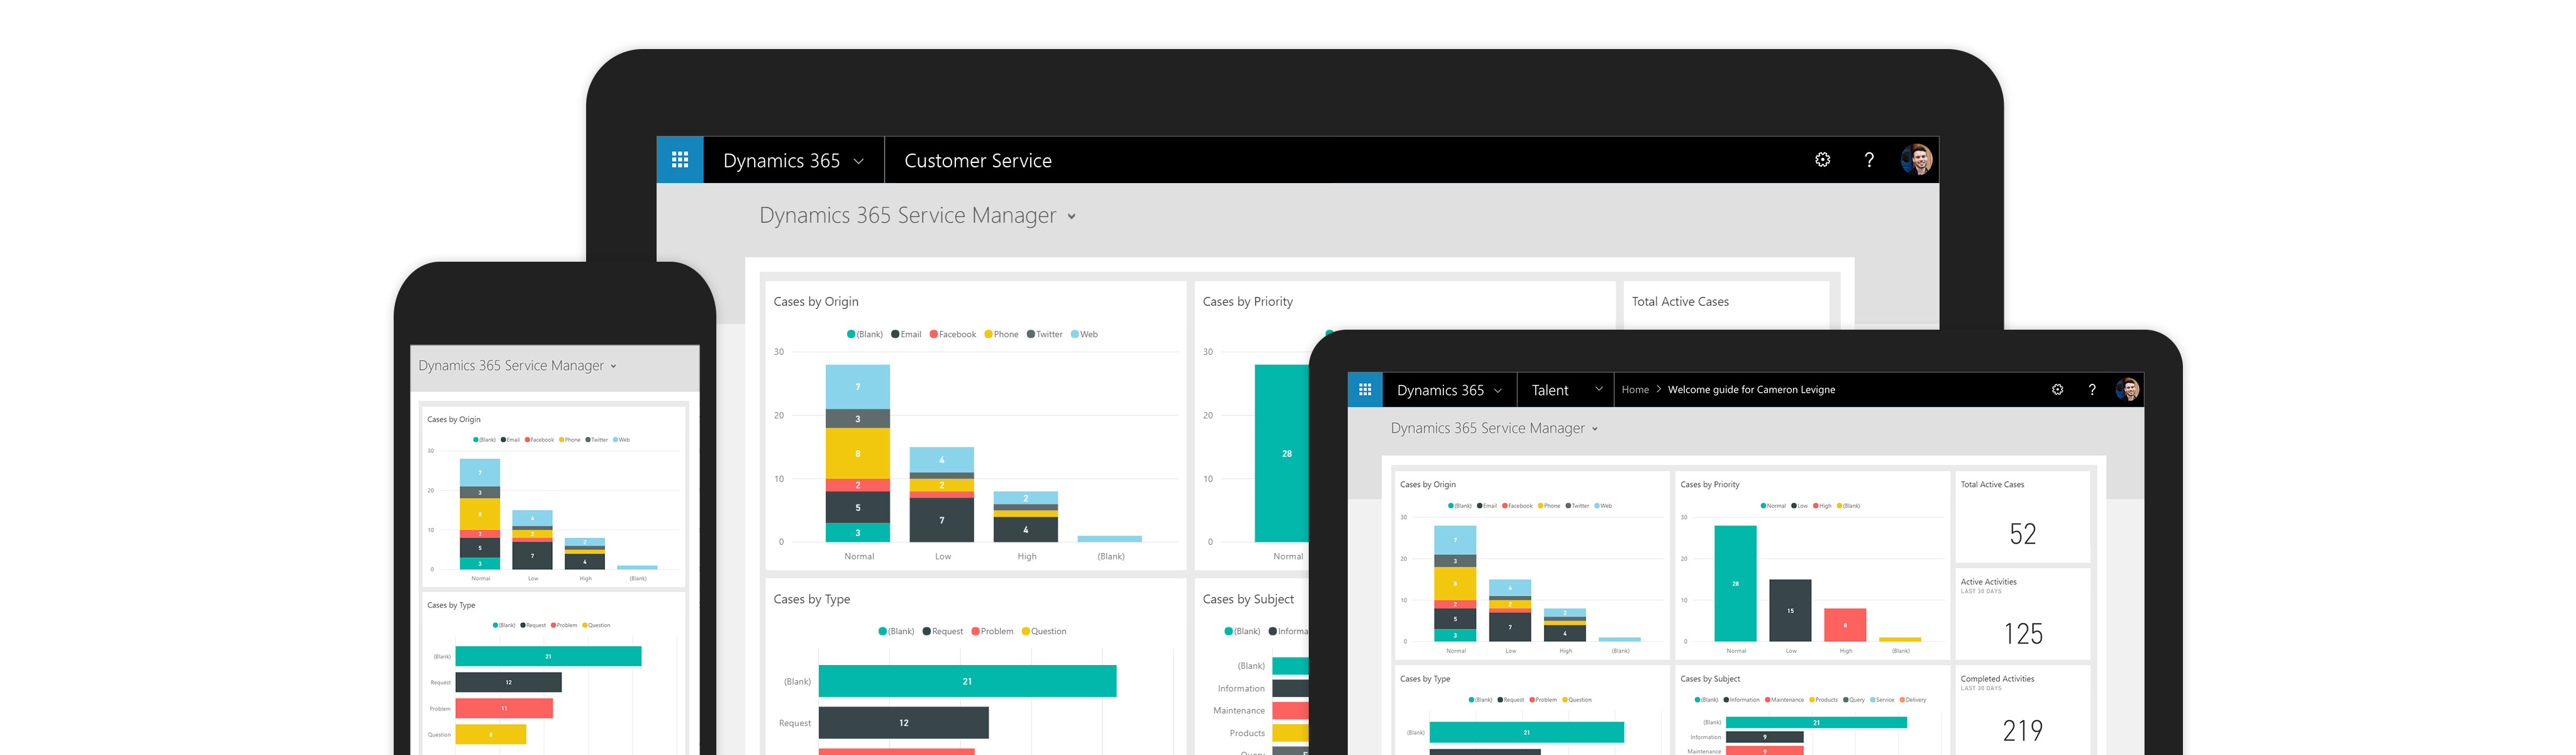 Dynamics 365 Customer Service